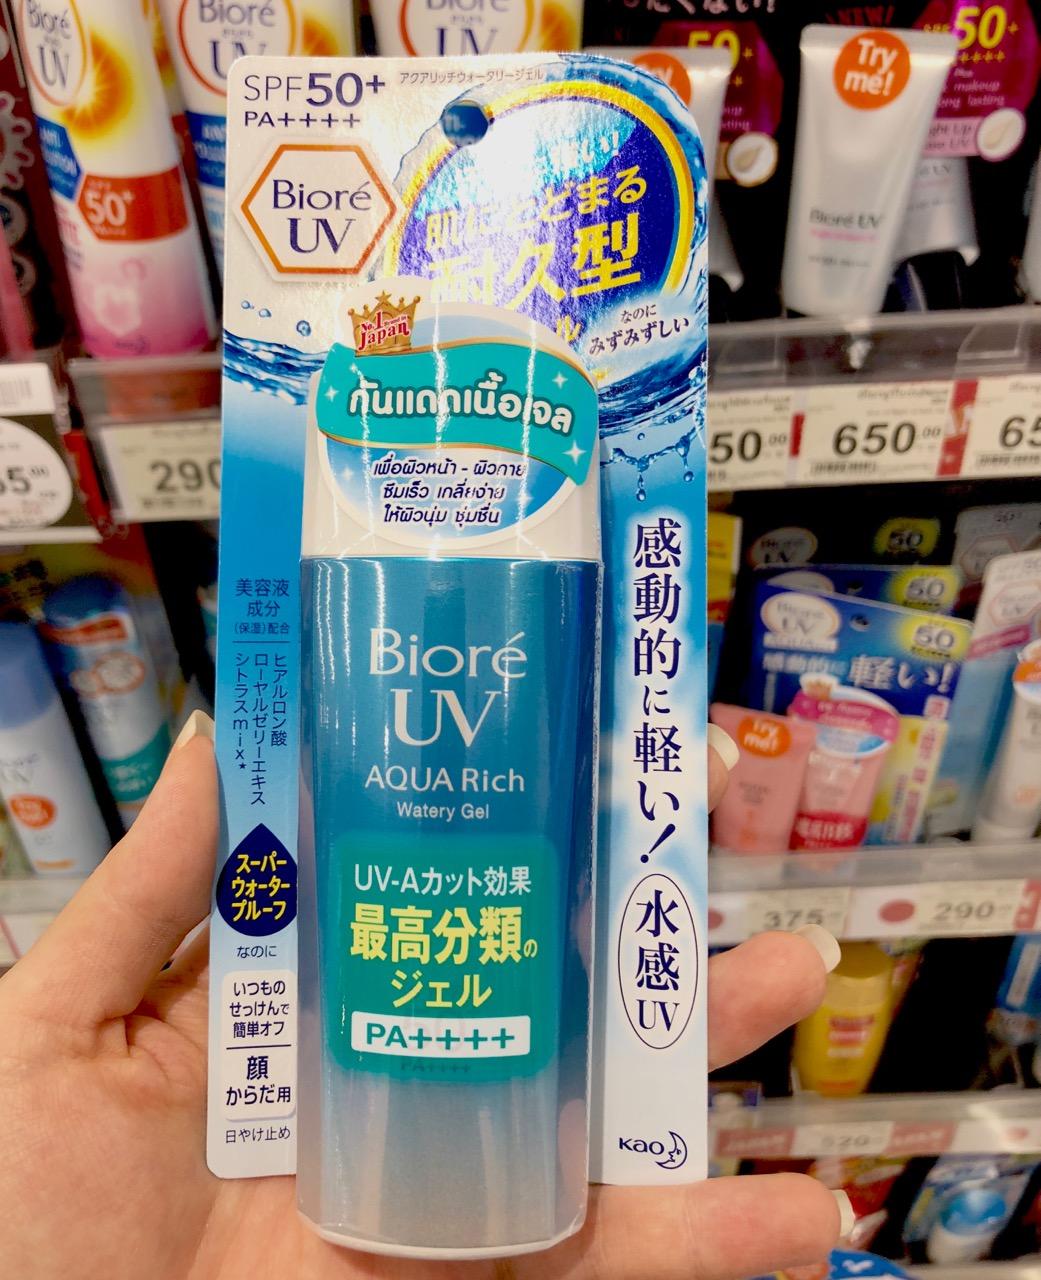 Bioré UV AQUA Rich Watery Gel SPF50+ PA++++ Ostolakossa aurinkovoide kasvoille